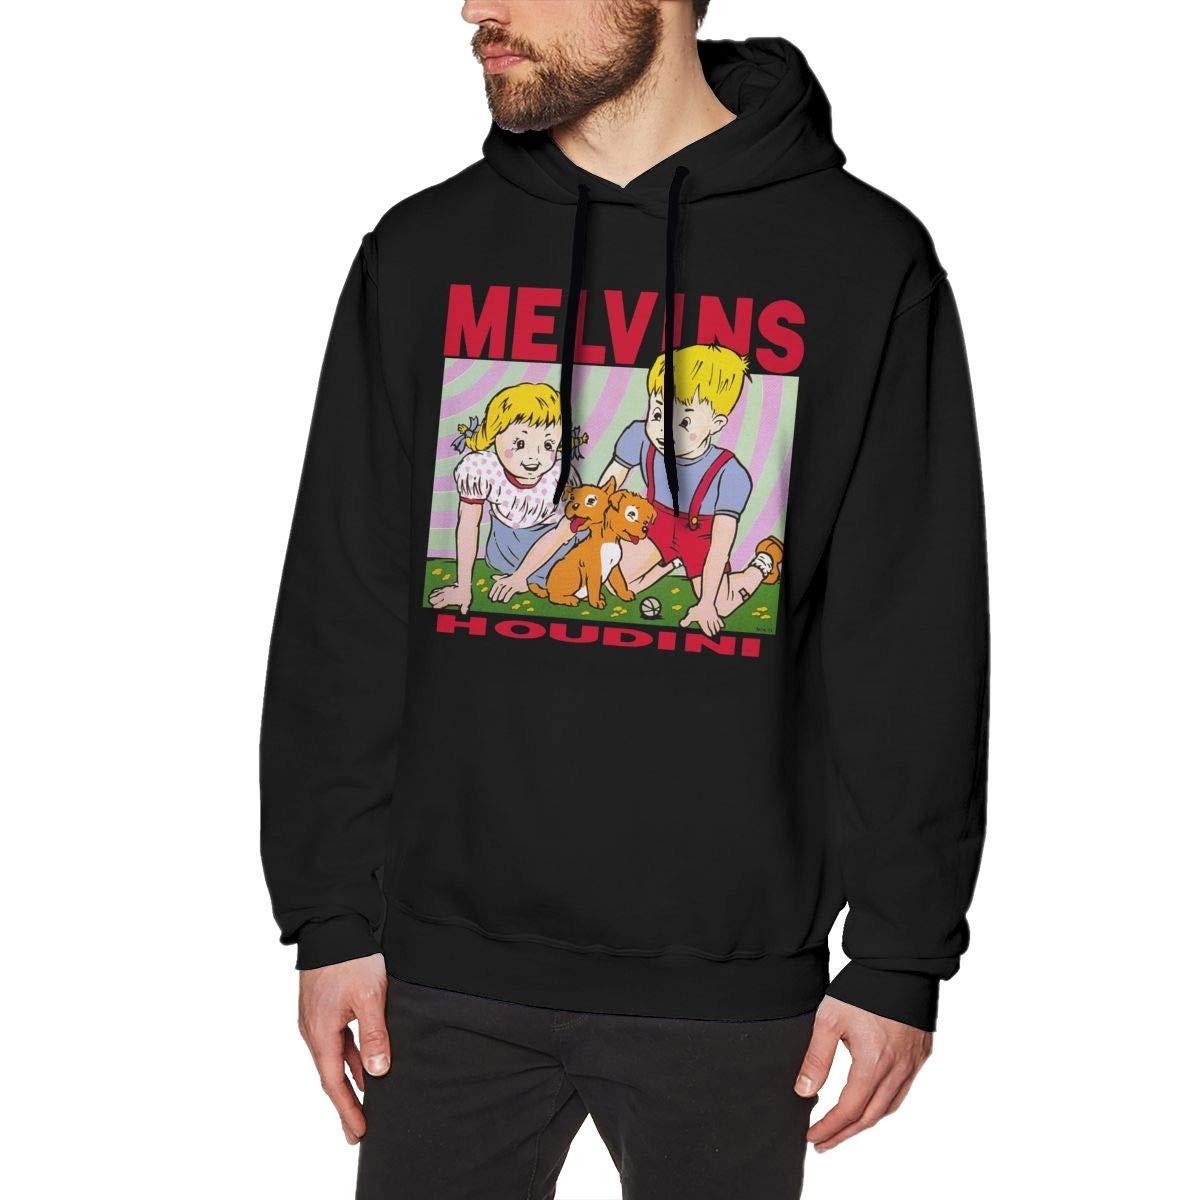 NAGEYI Men's Melvins-Houdini Design Hoodies Pullover Adult Sweatshirt